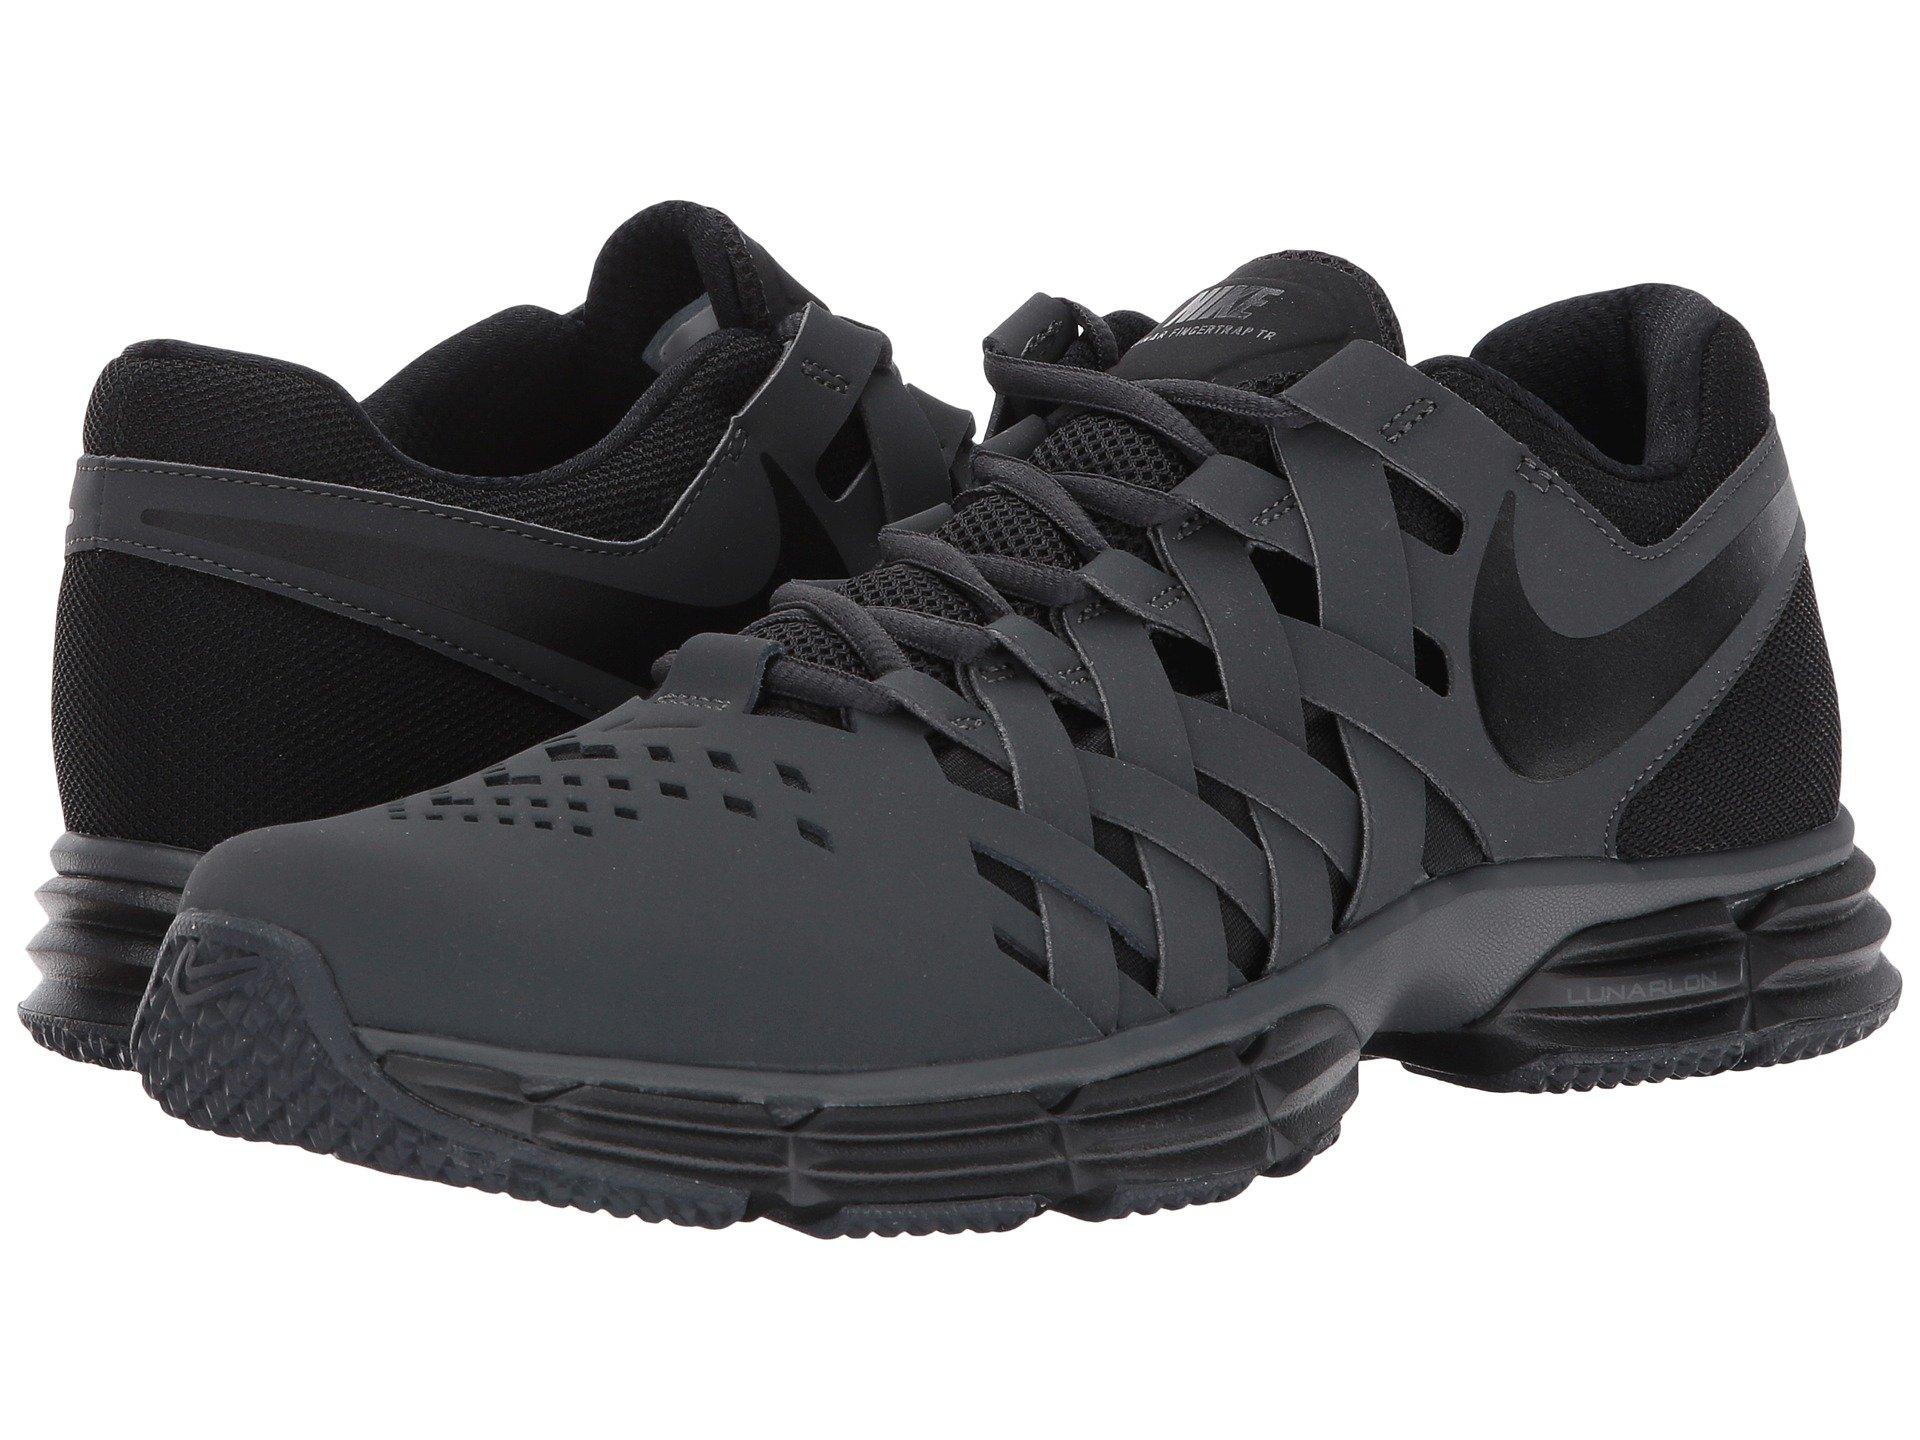 Nike Finger Shoes